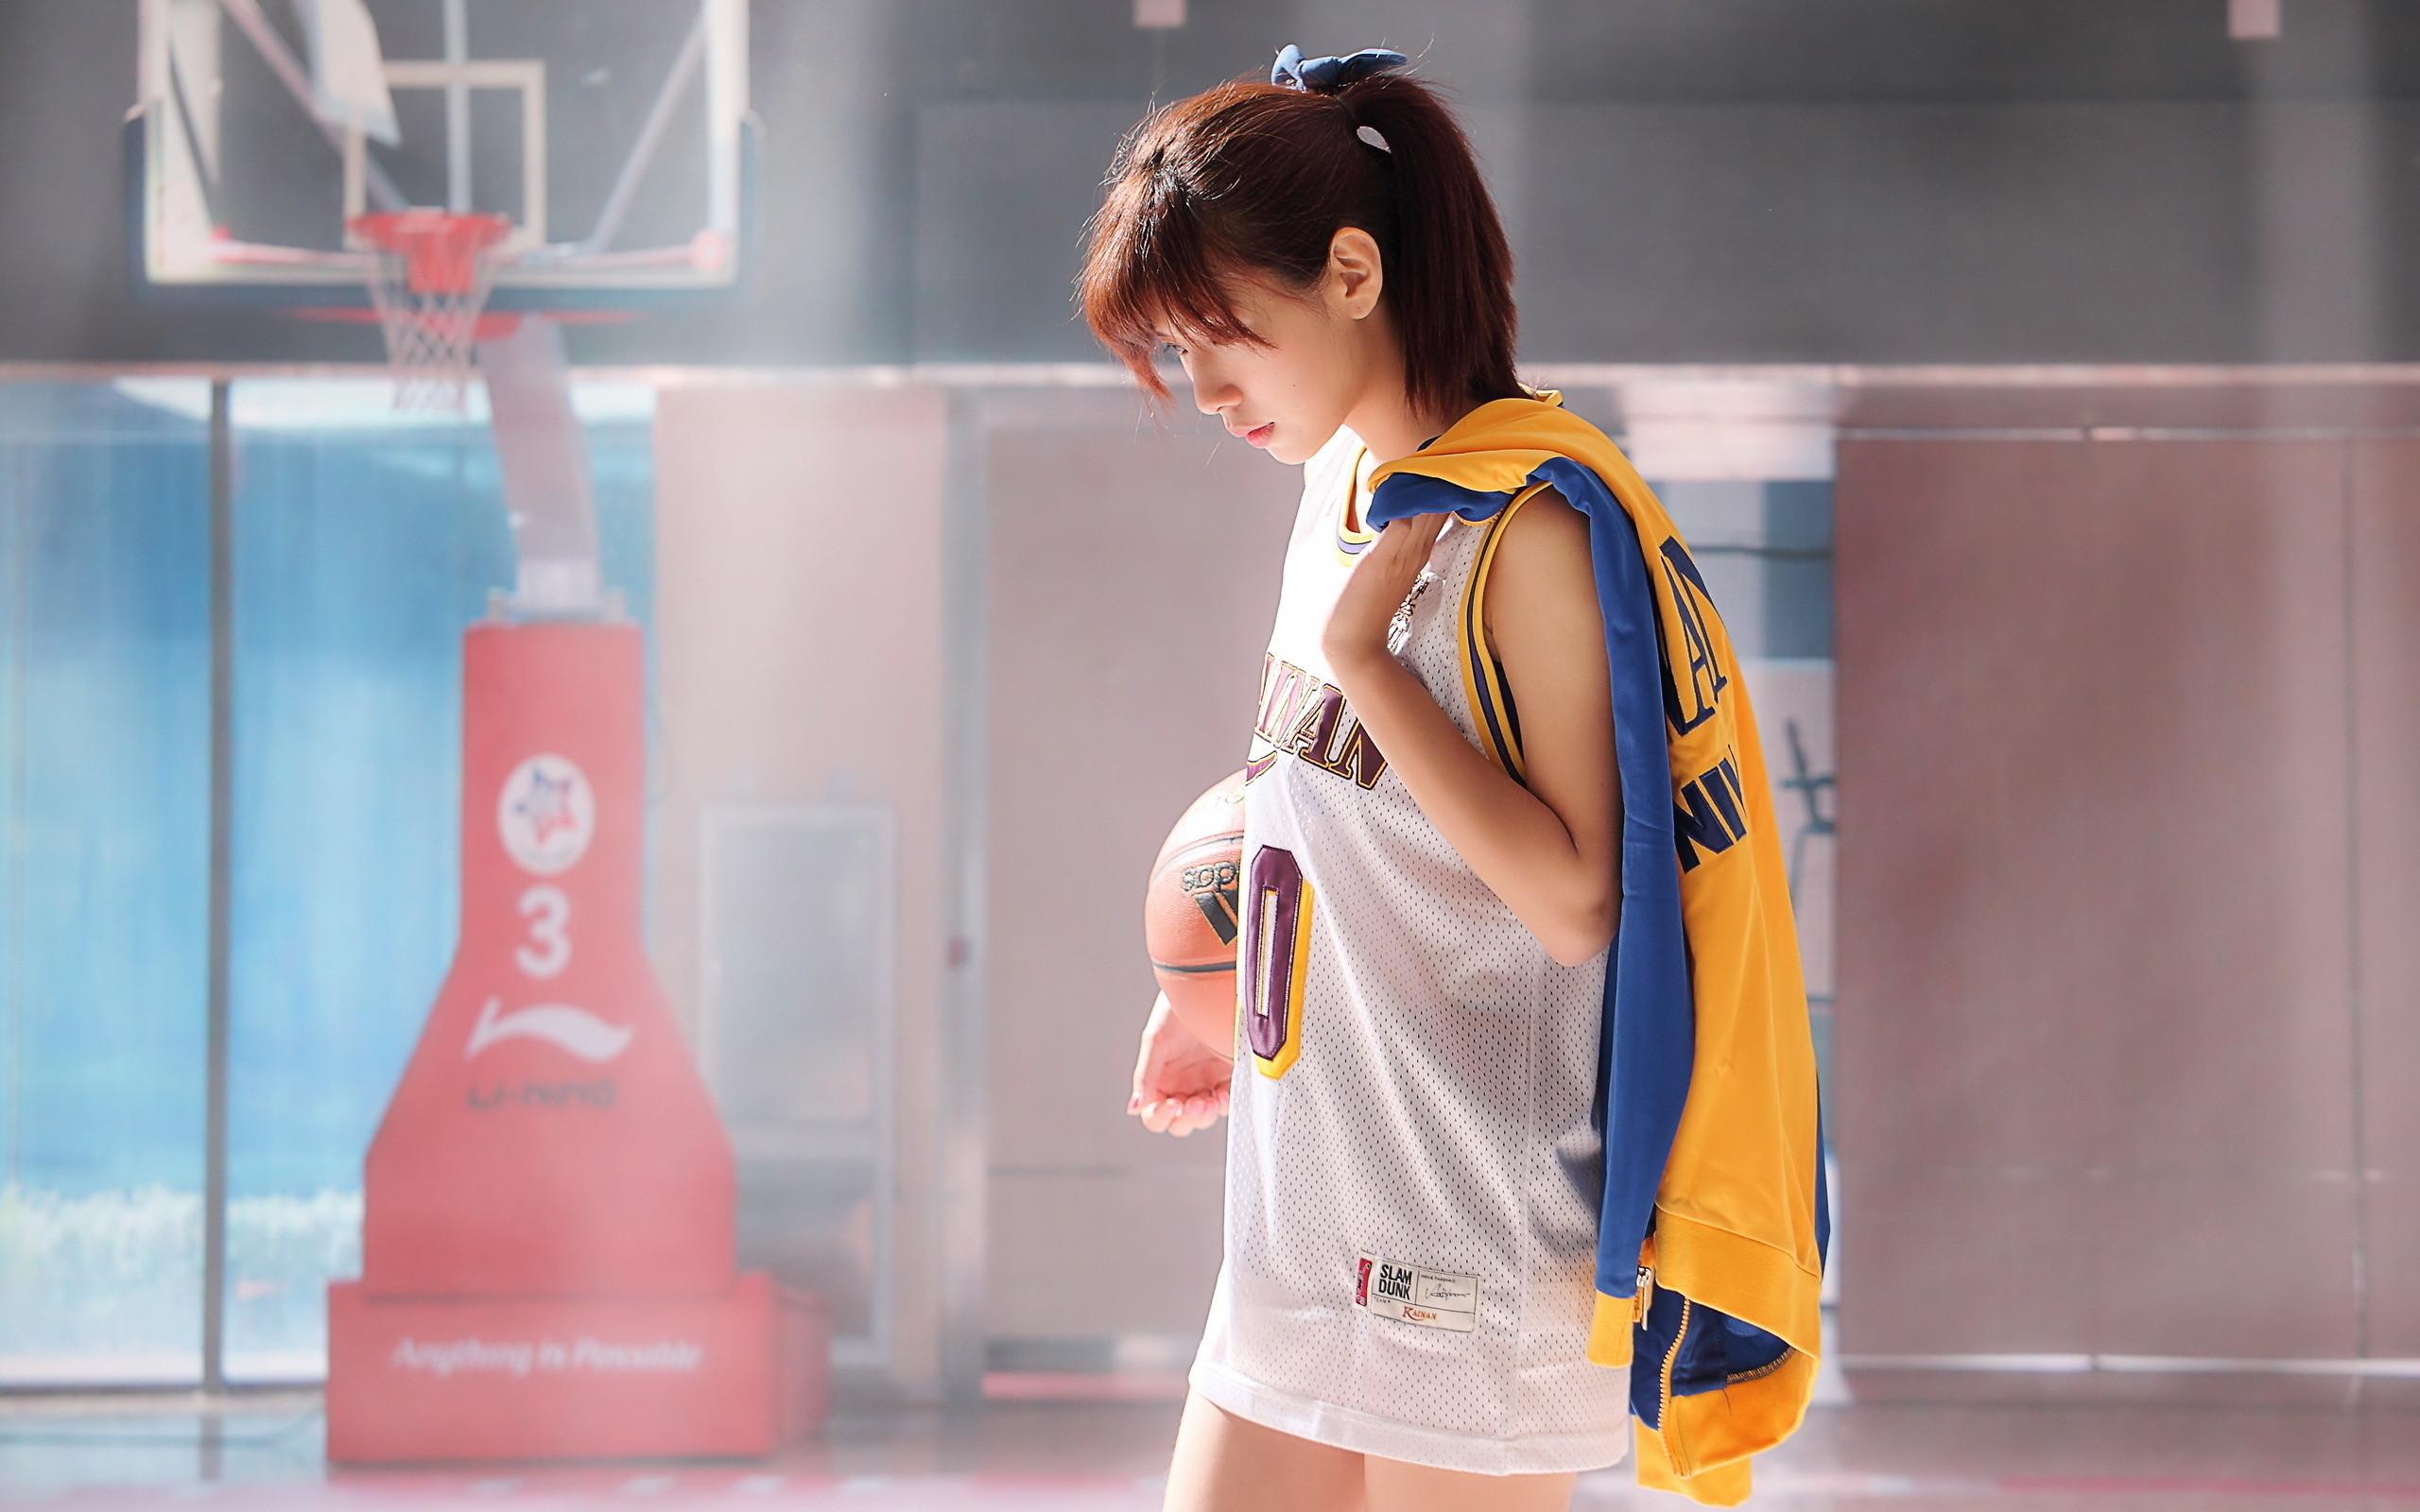 Basketball mobile wallpapers Download free Basketball